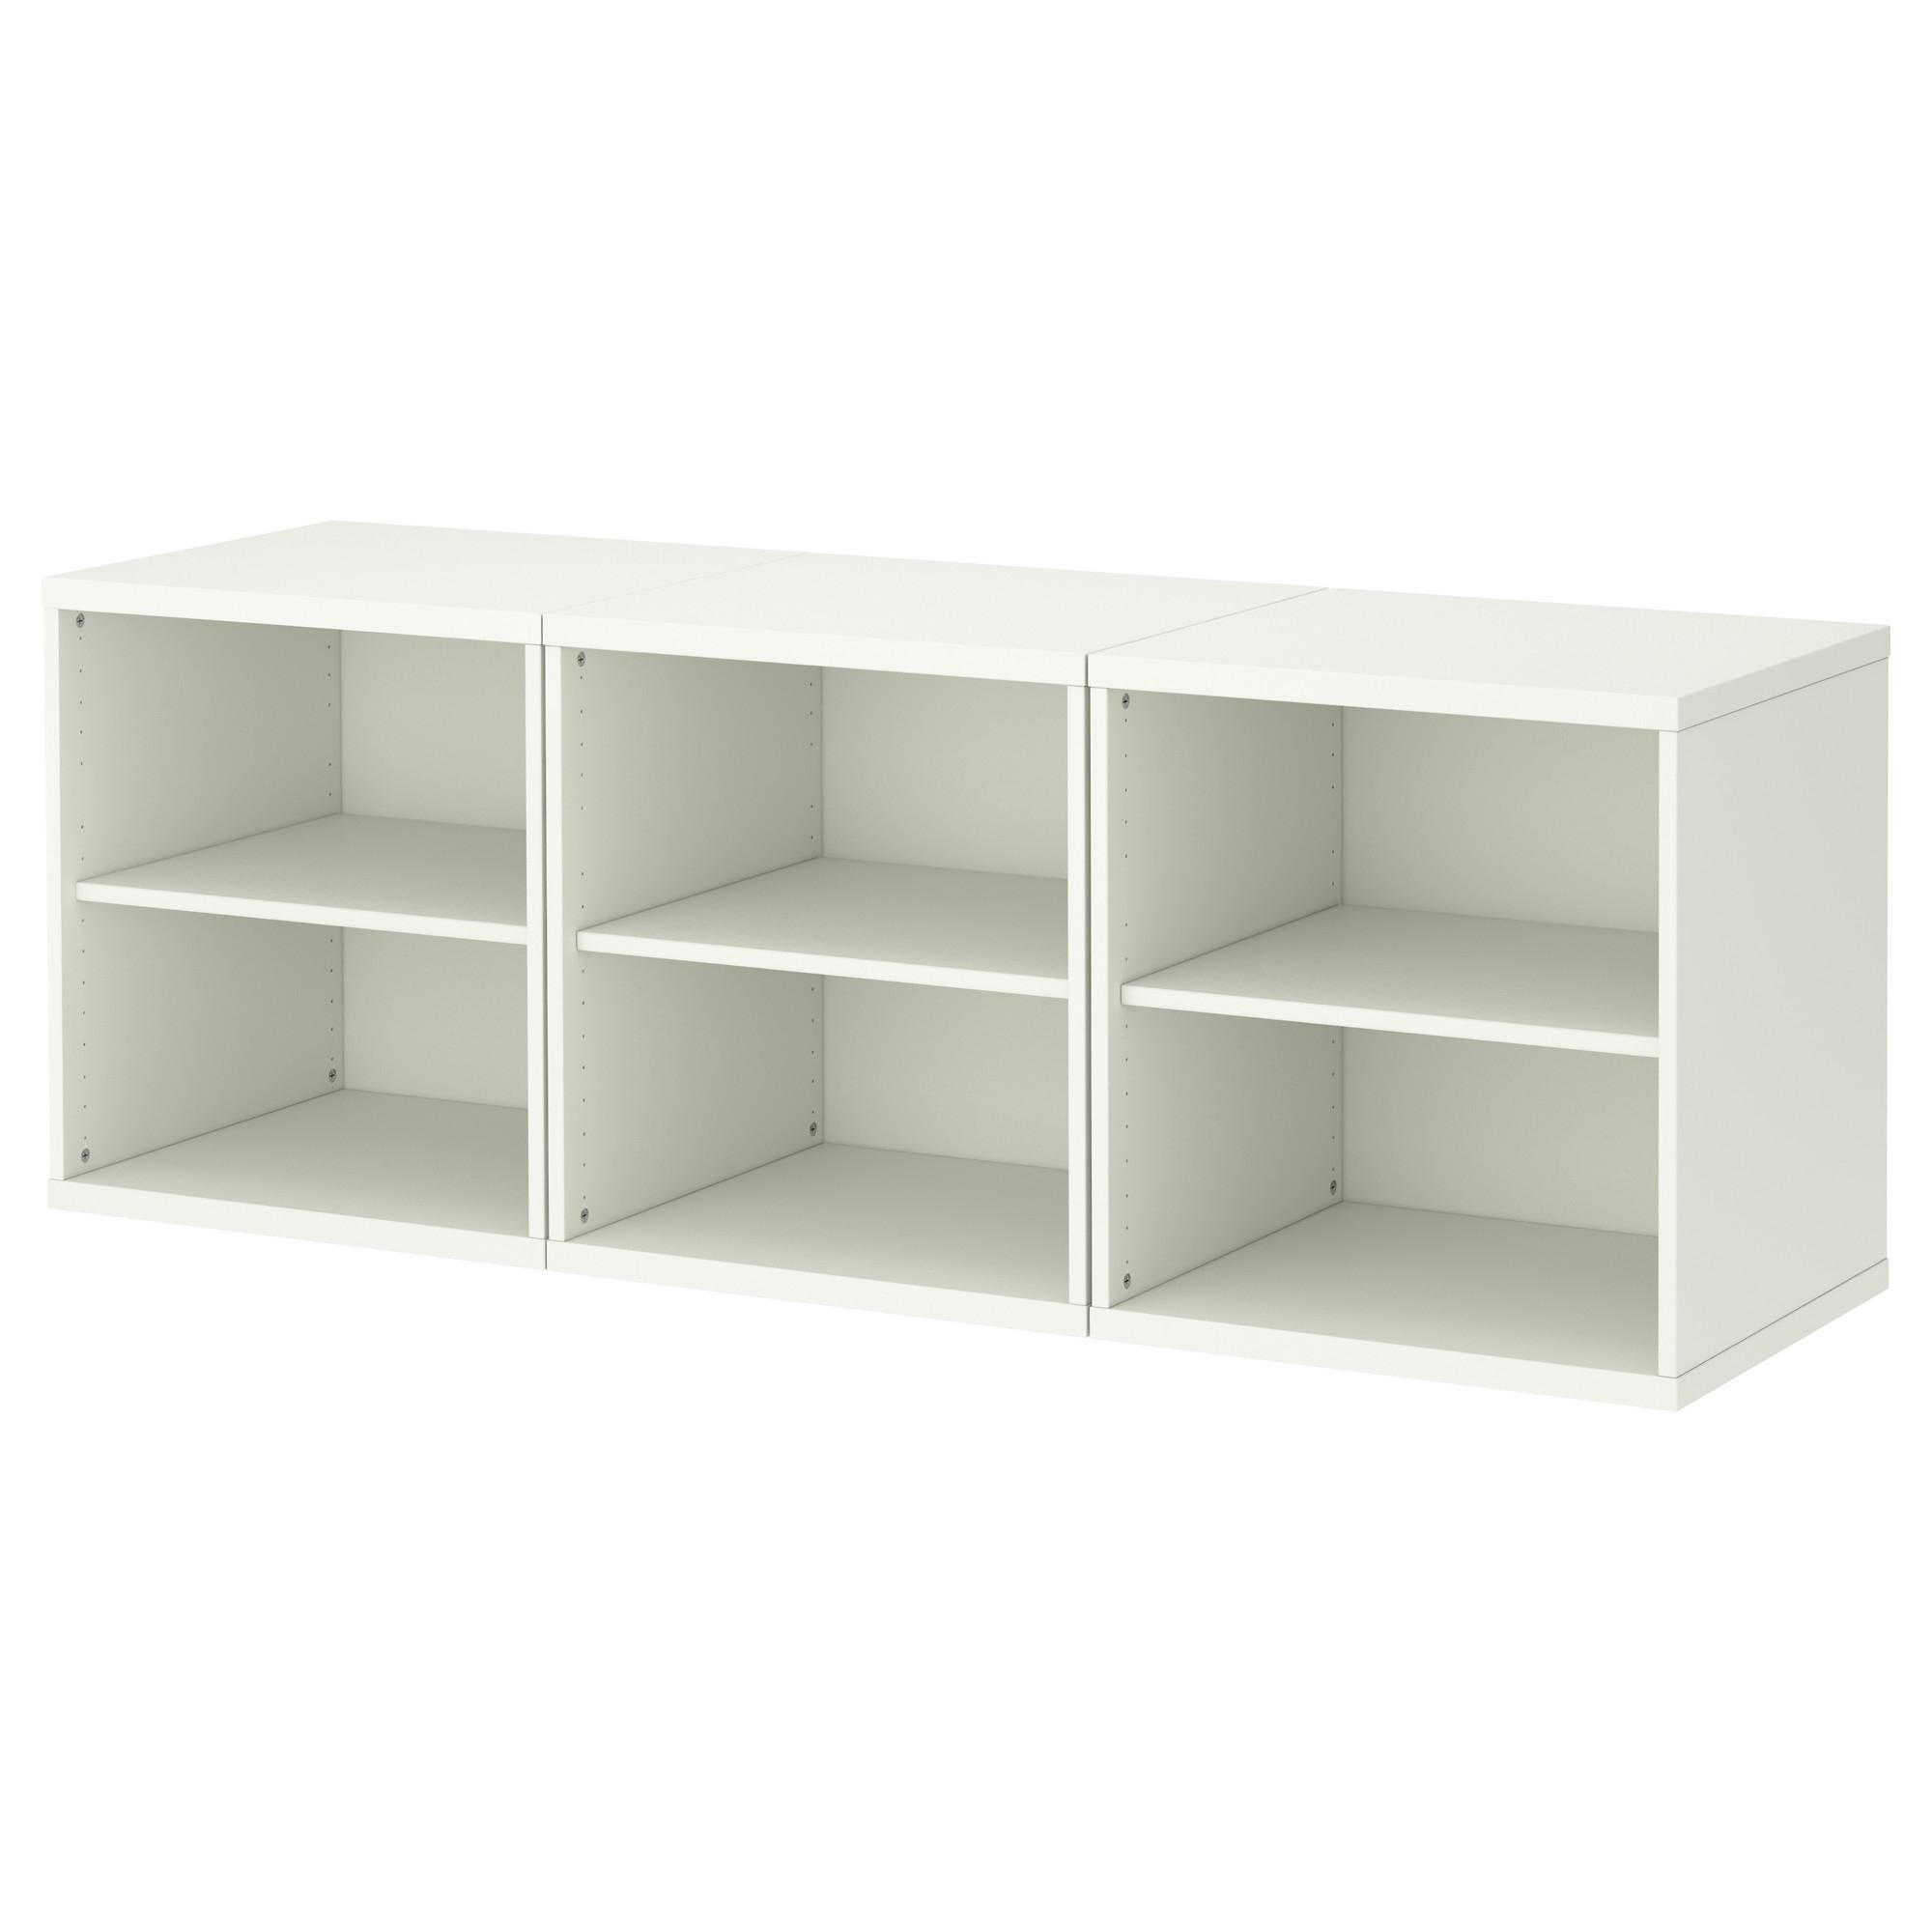 Stuva combinaci n de almacenaje estantes - Armarios almacenaje ikea ...